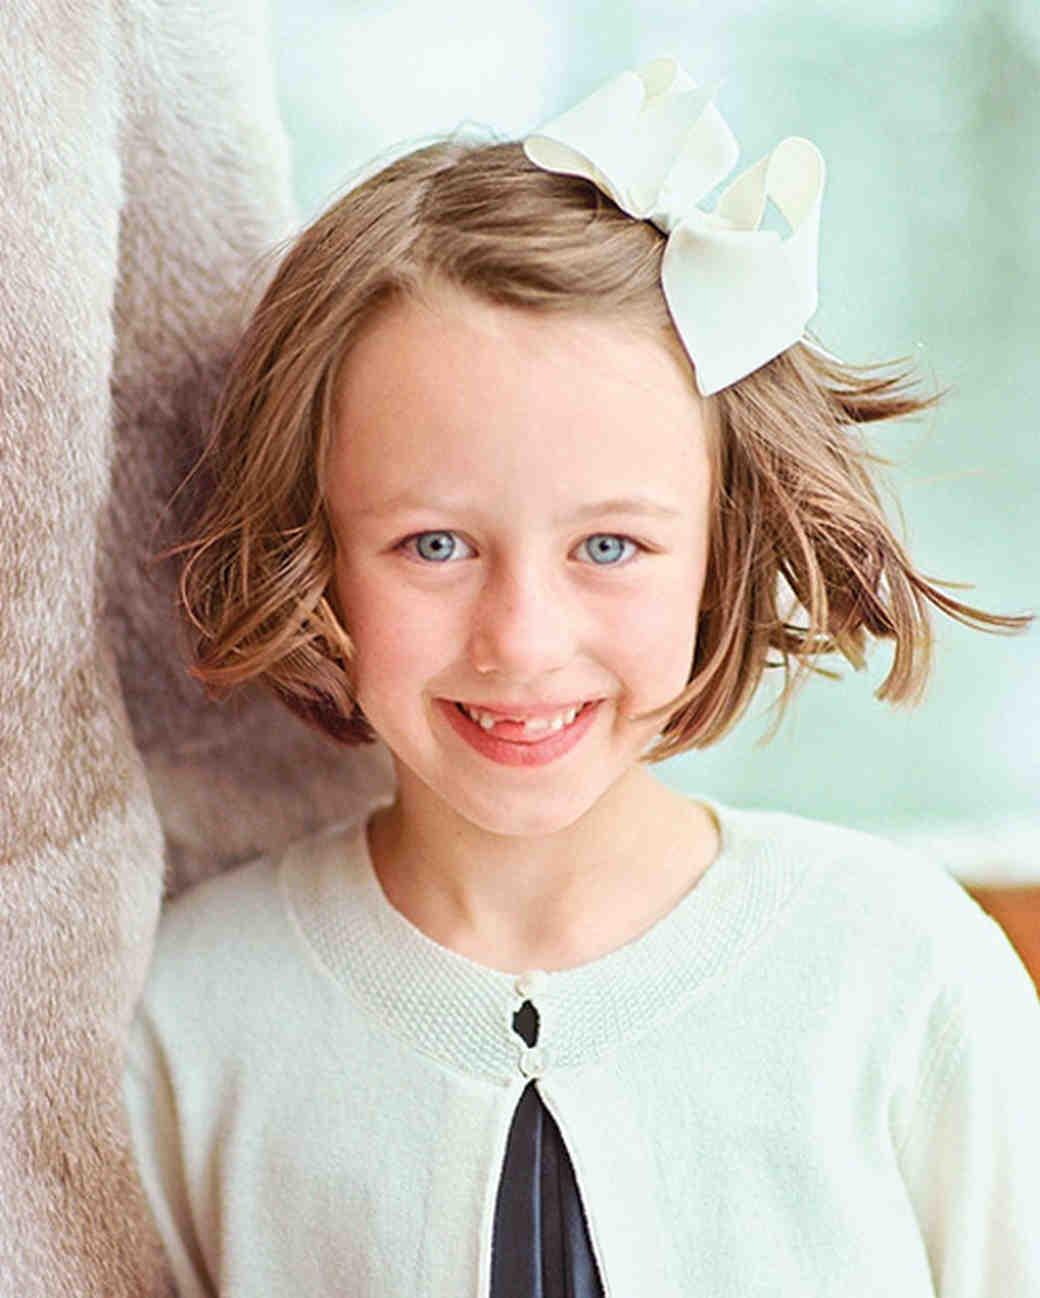 mw2117_0110_stoutflowergirl.jpg